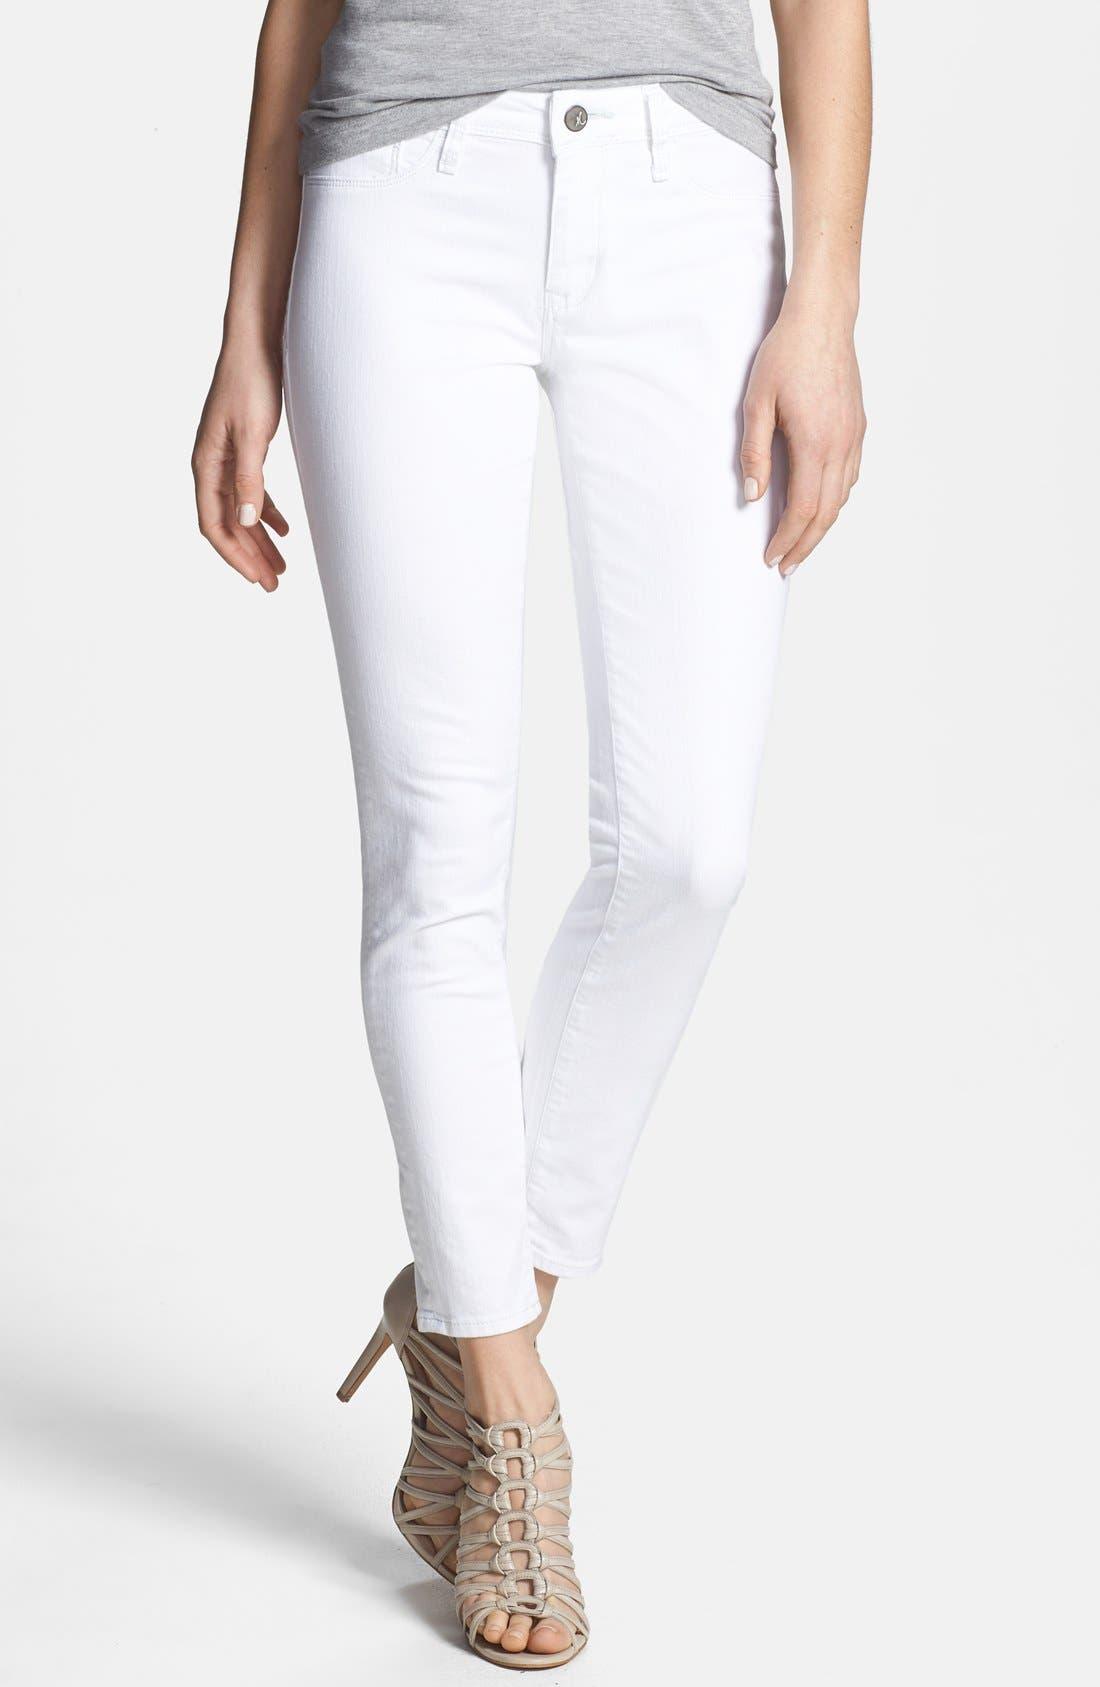 Alternate Image 1 Selected - Mavi Jeans 'Alexa' Stretch Ankle Skinny Jeans (White Nolita)